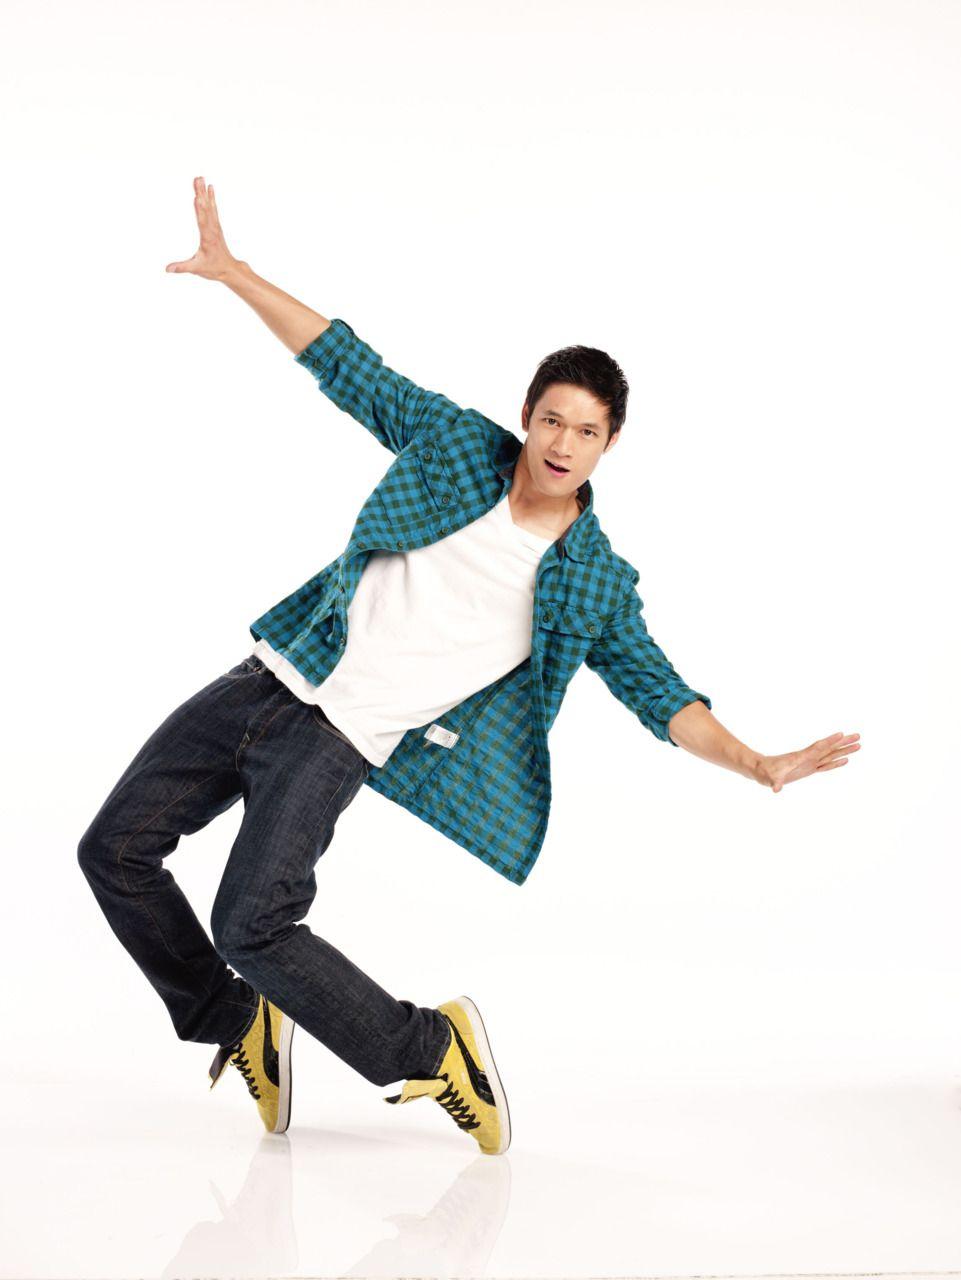 Harry Shum Jr Dancing Gif